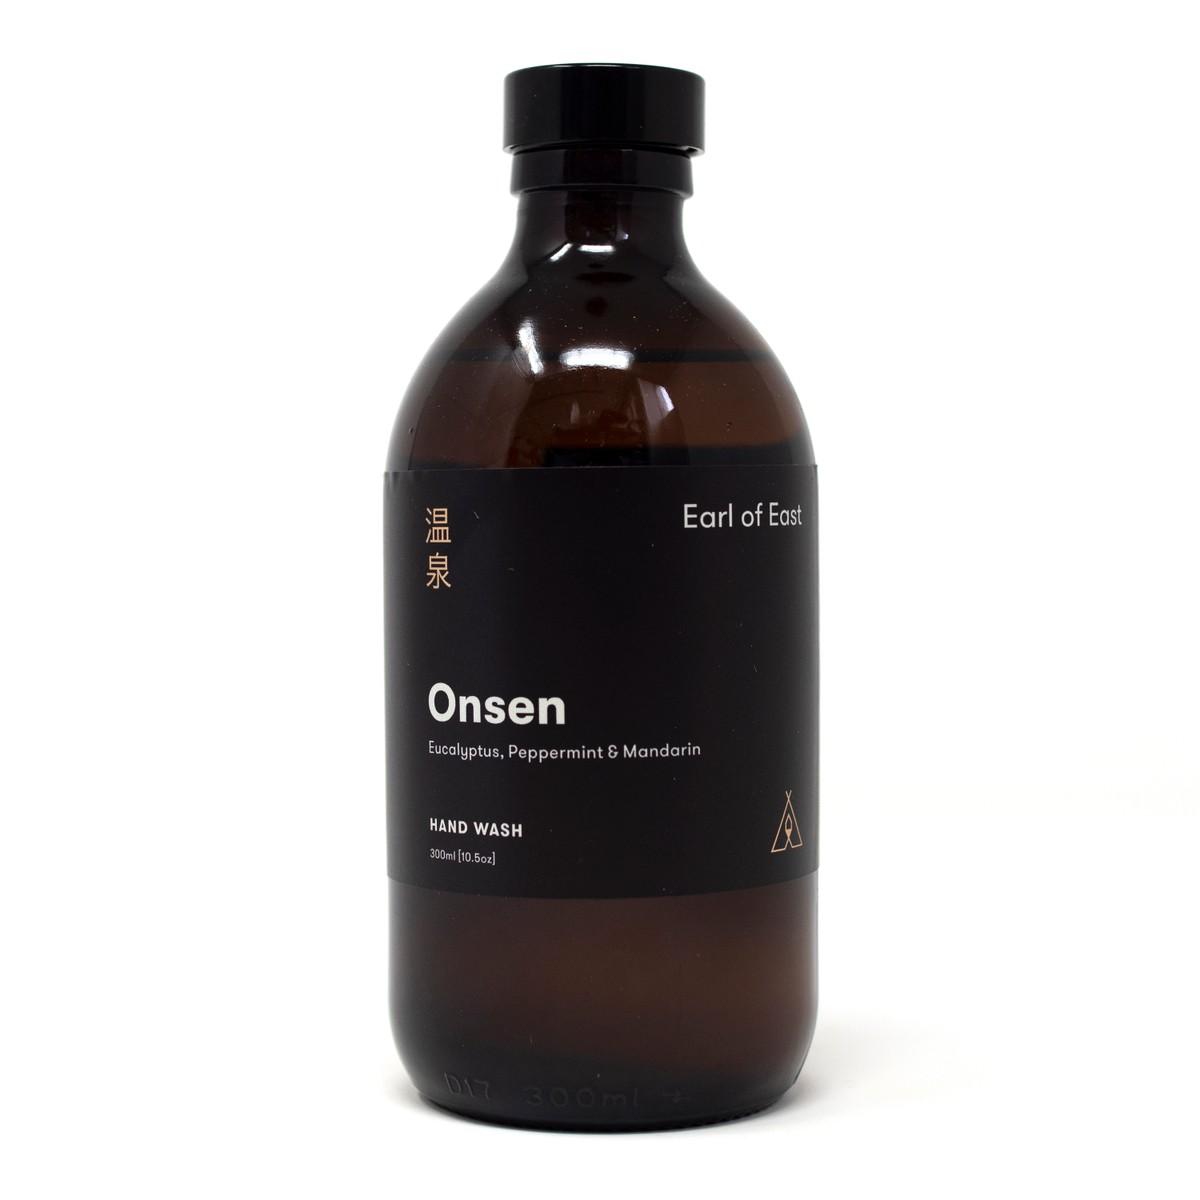 Photo of Onsen Luxury Hand Wash